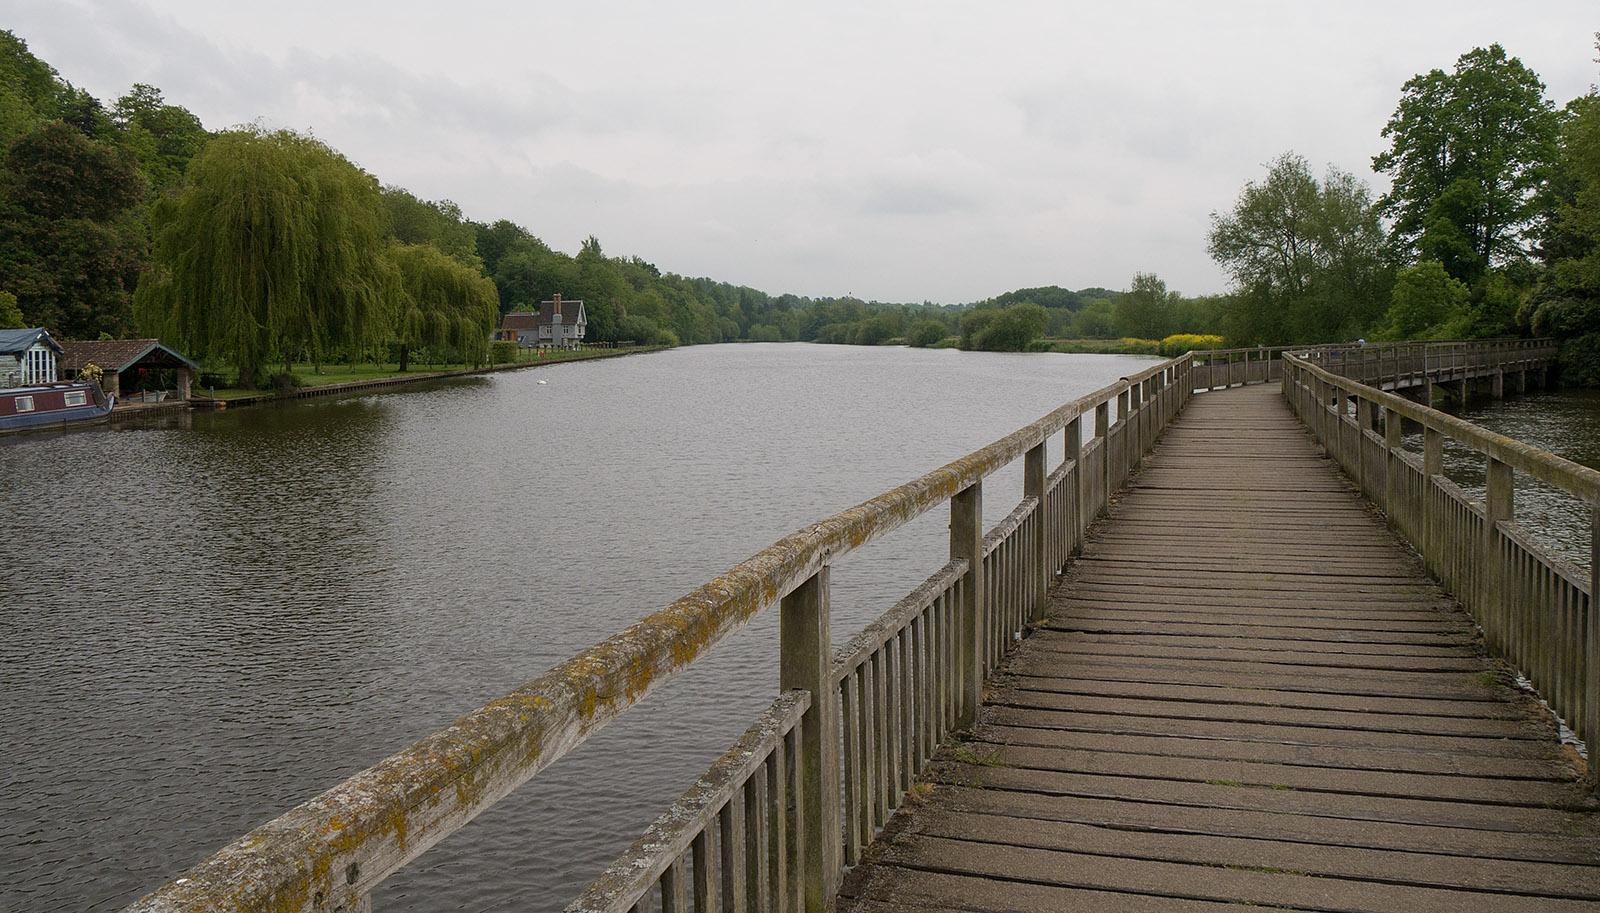 Southern side of the bridge at Marsh Lock